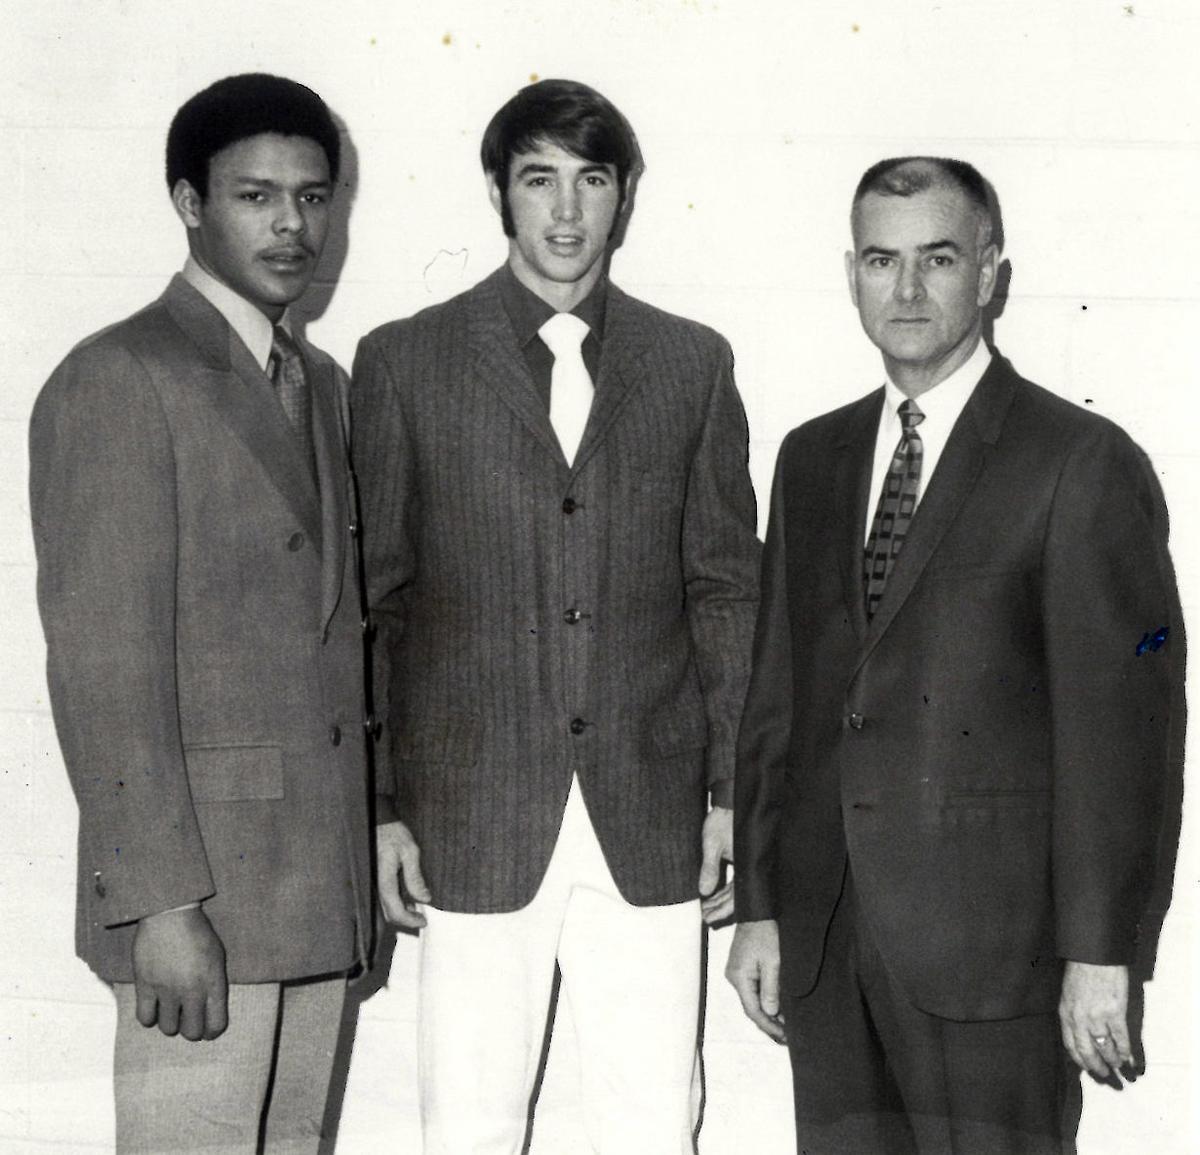 Mack Peyton with Scott Jones and Rick Brown